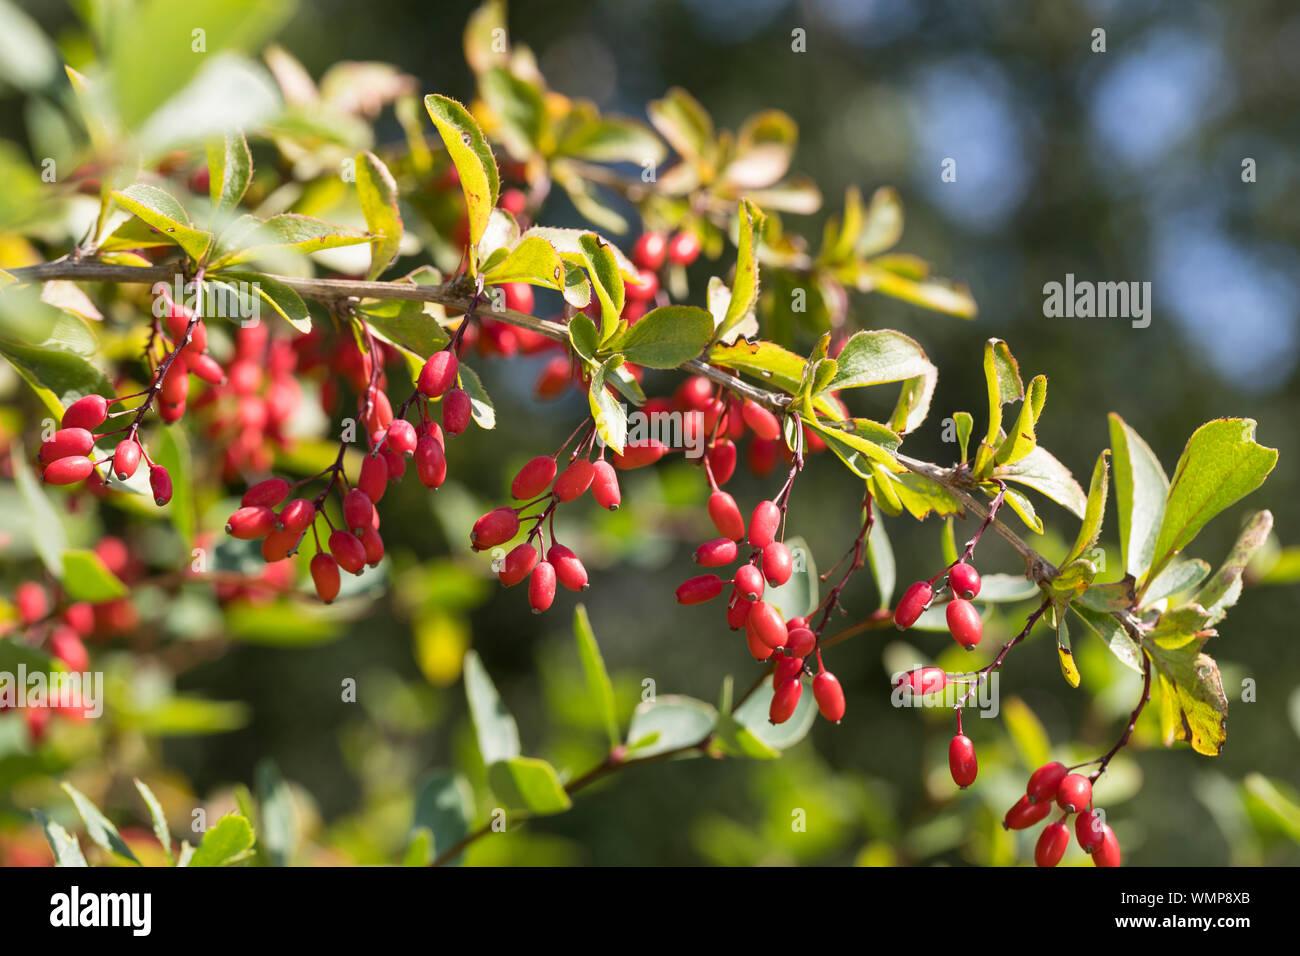 Sauerdorn Gewöhnliche Berberitze Essigbeere Berberis vulgaris